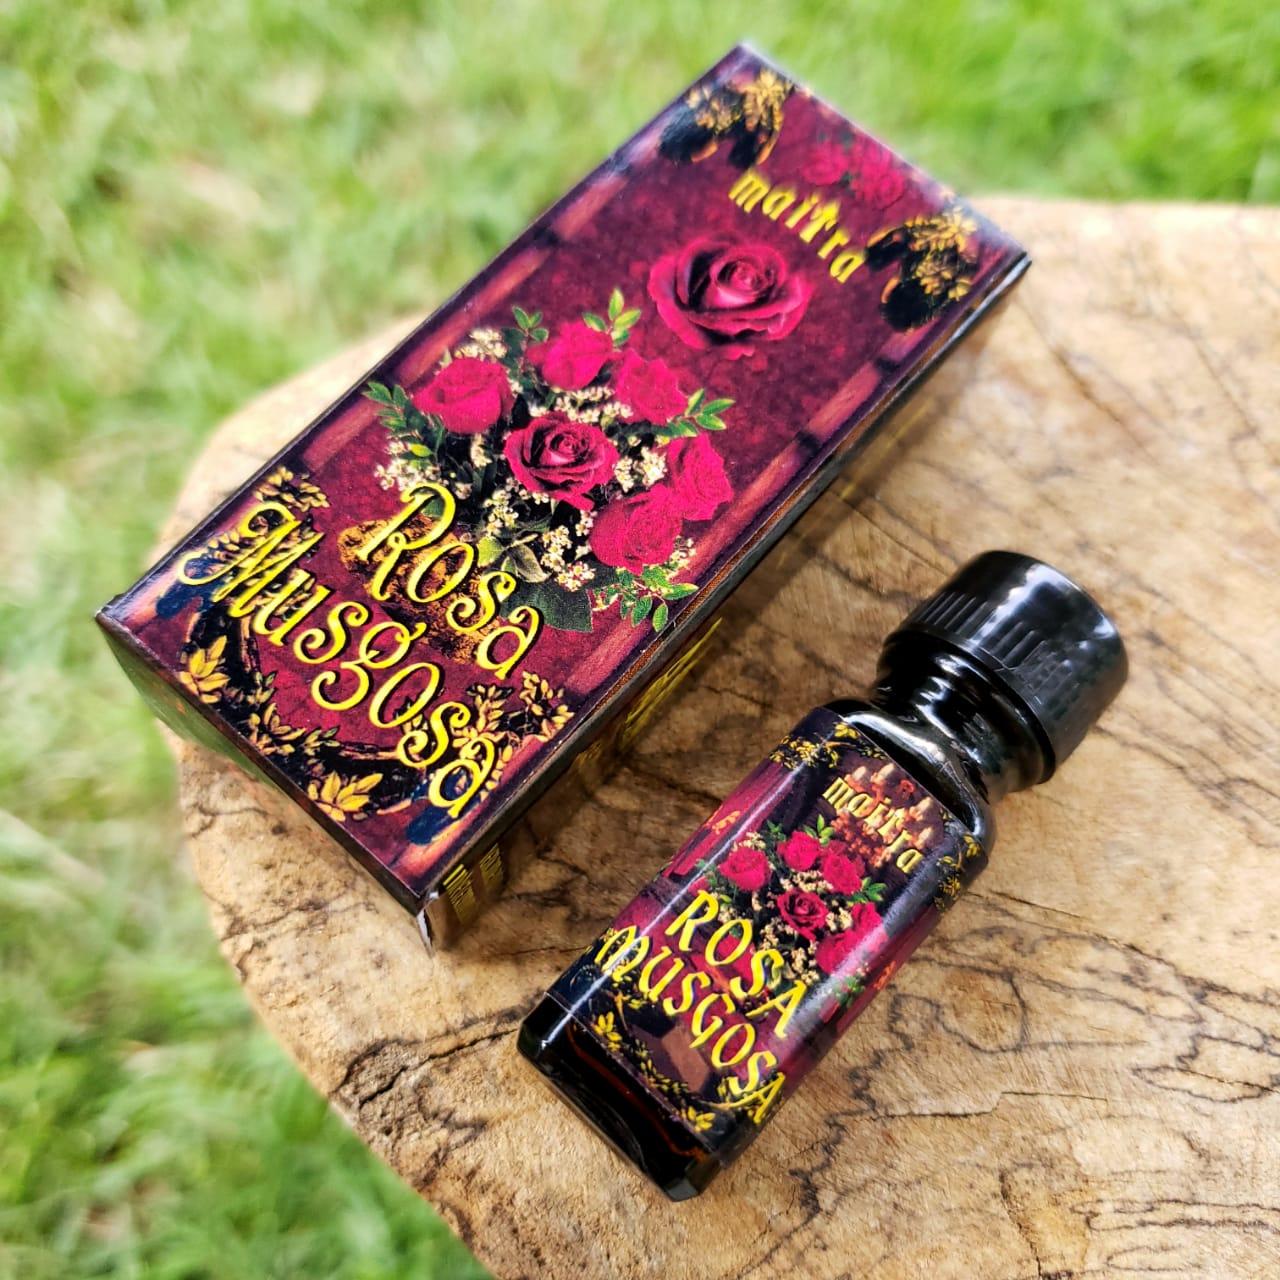 Rosa Musgosa Óleo Aromático 5 ml - Maitra